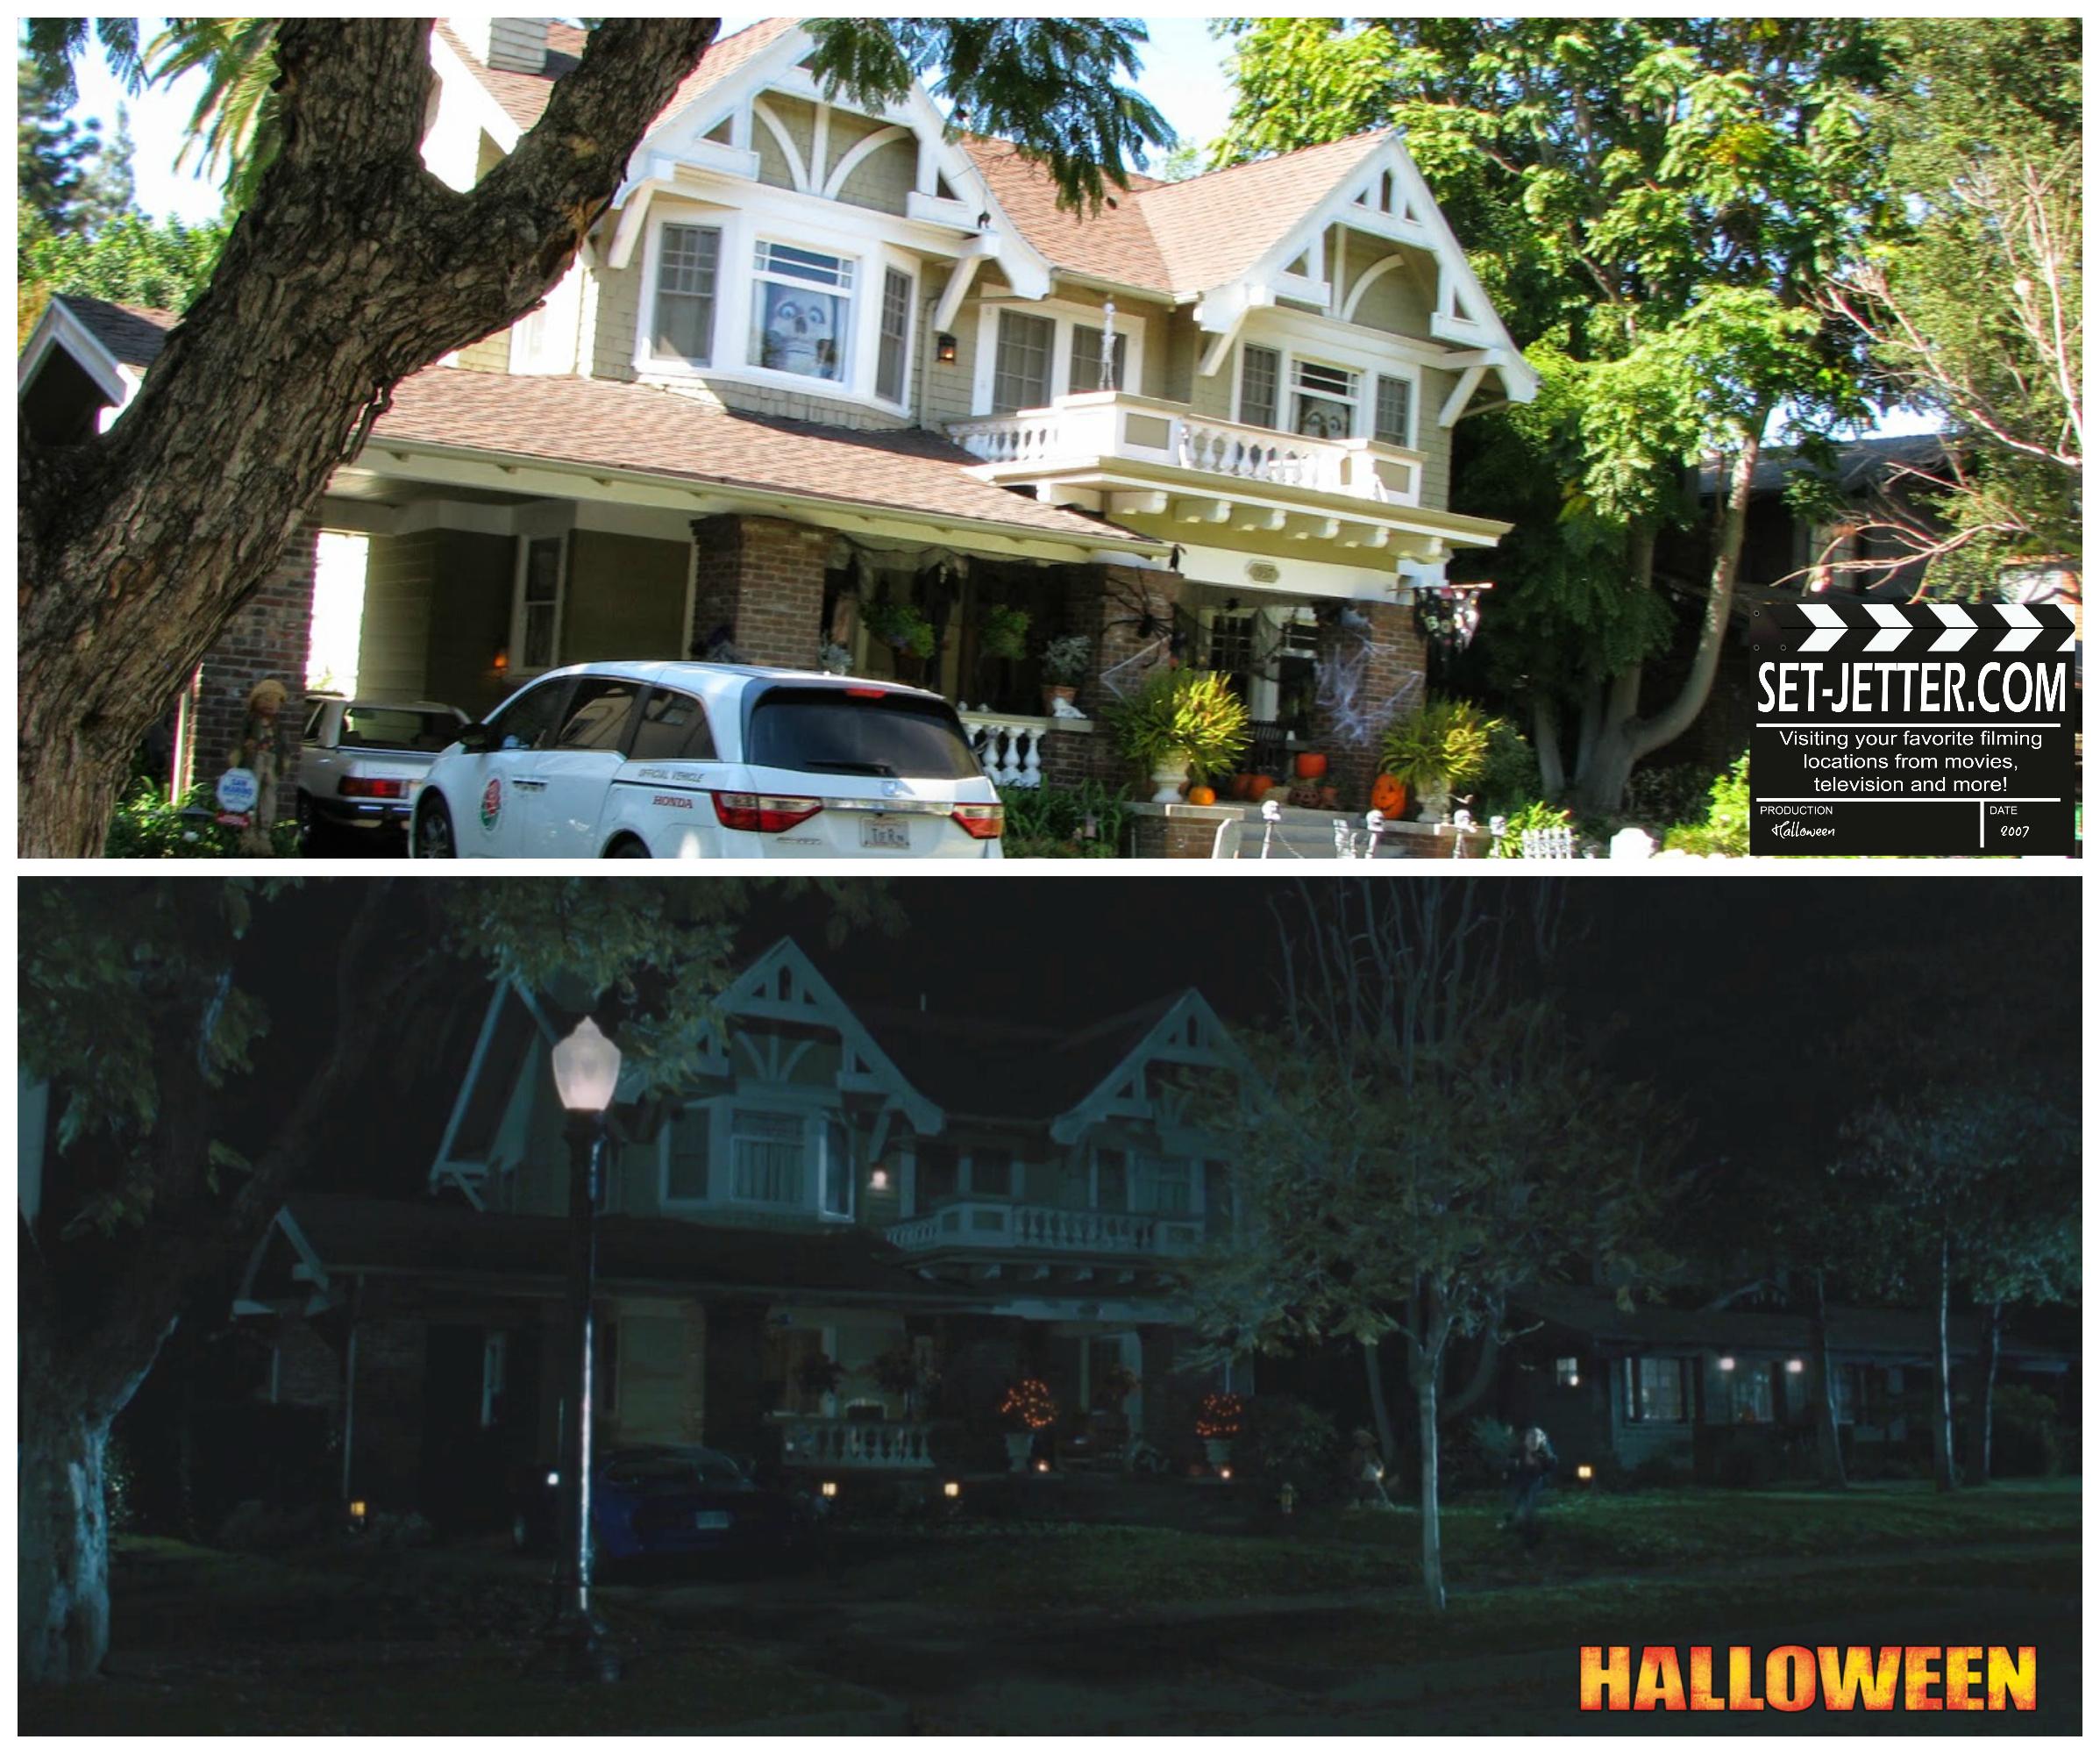 Halloween 2007 comparison 63.jpg